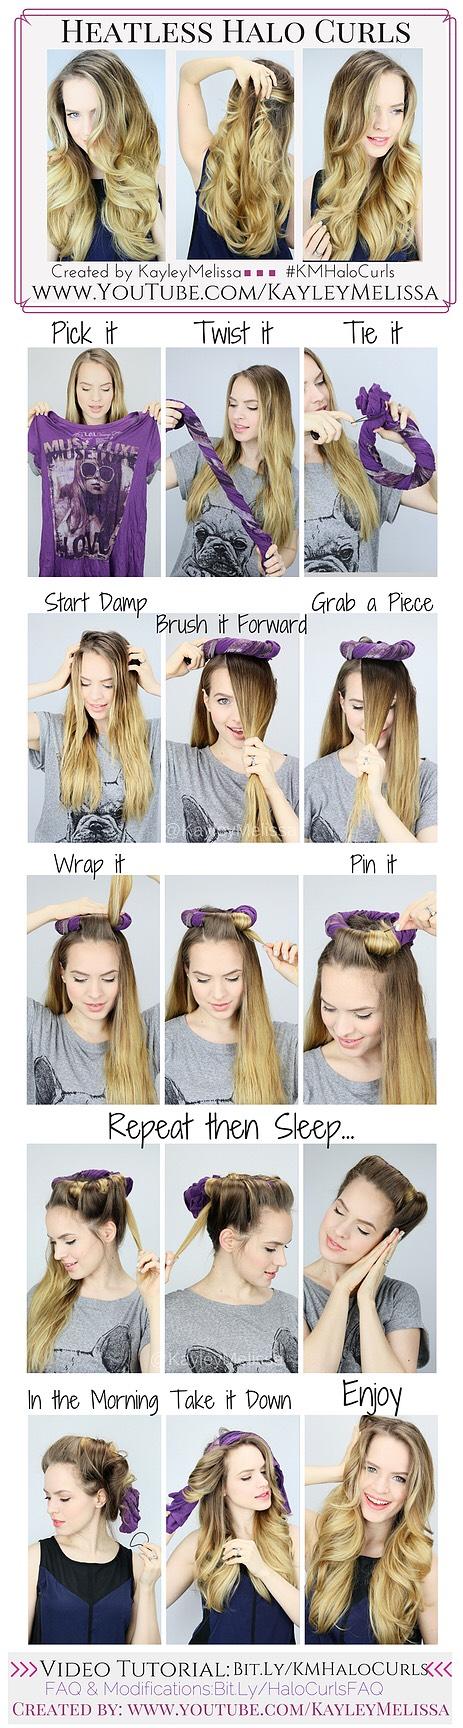 4) heatless halo curls!